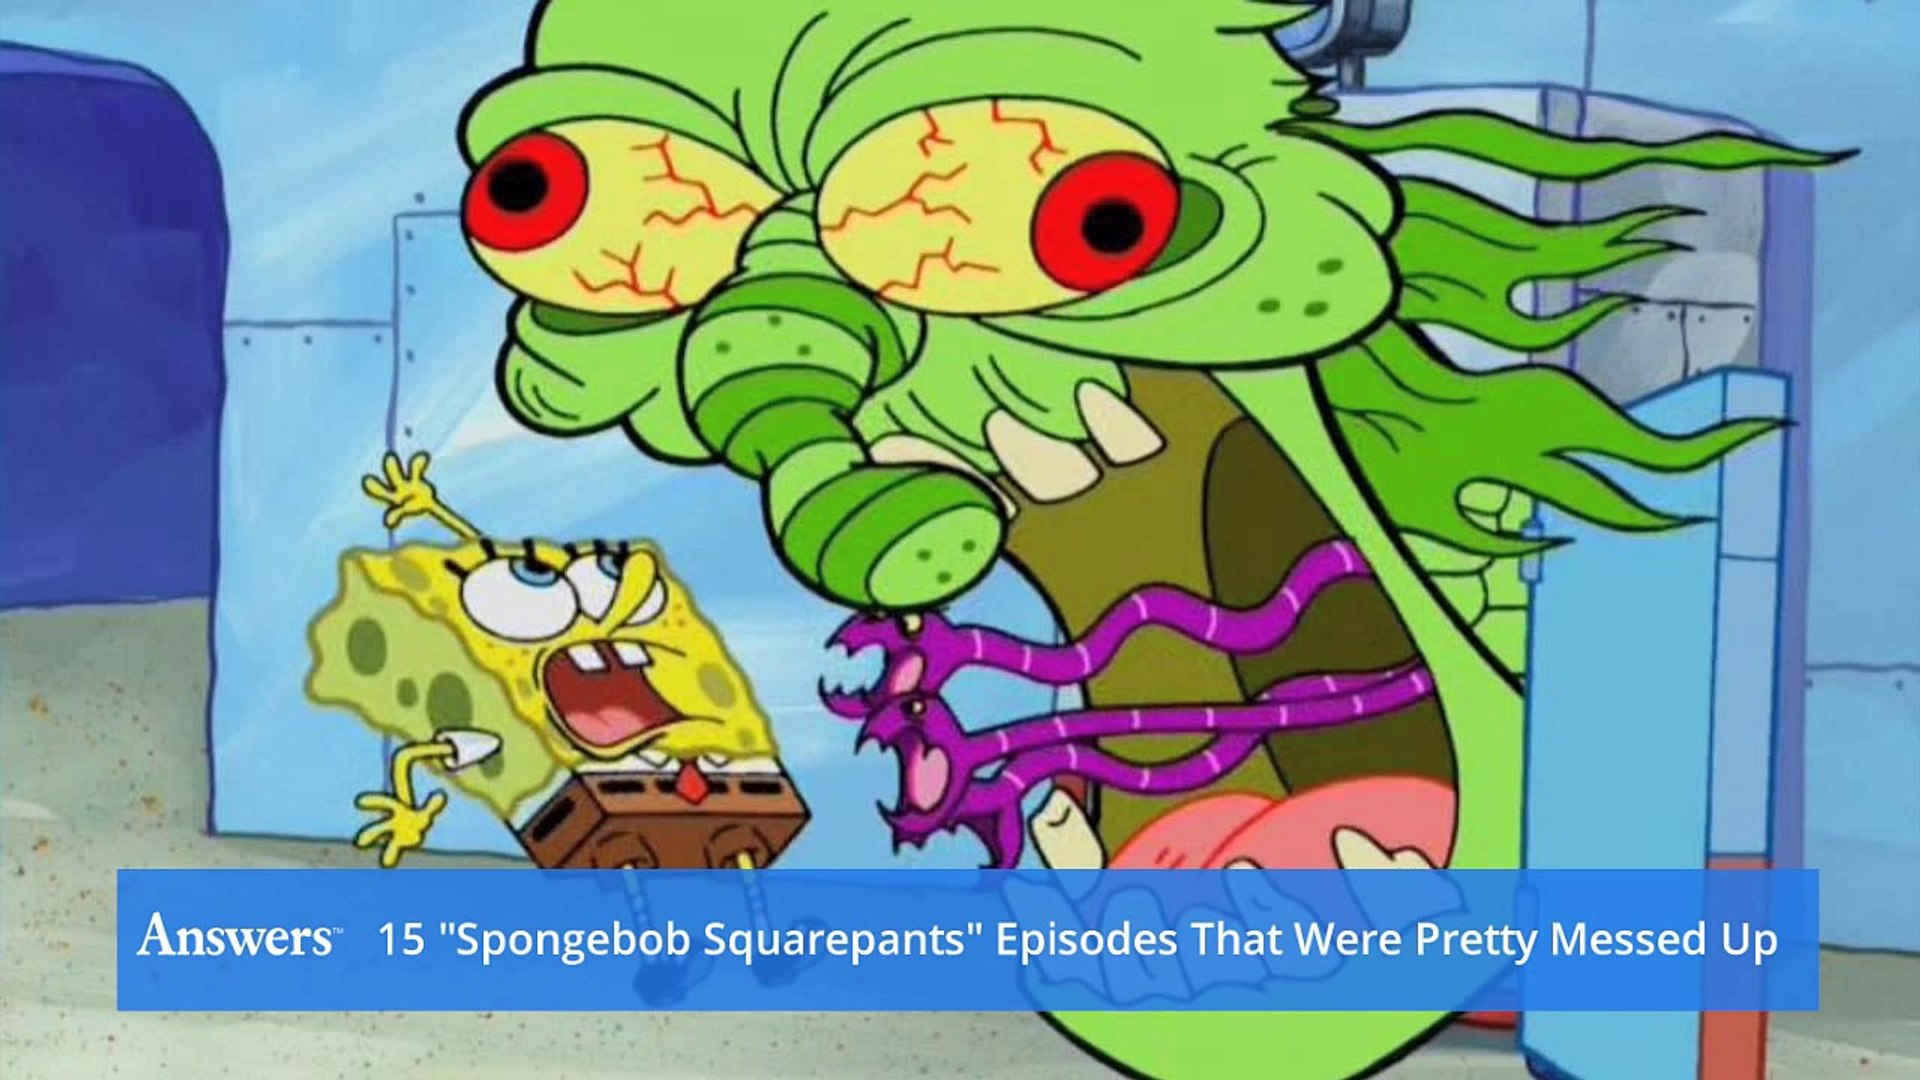 SpongeBob SquarePants Episodes That Were Pretty Messed Up